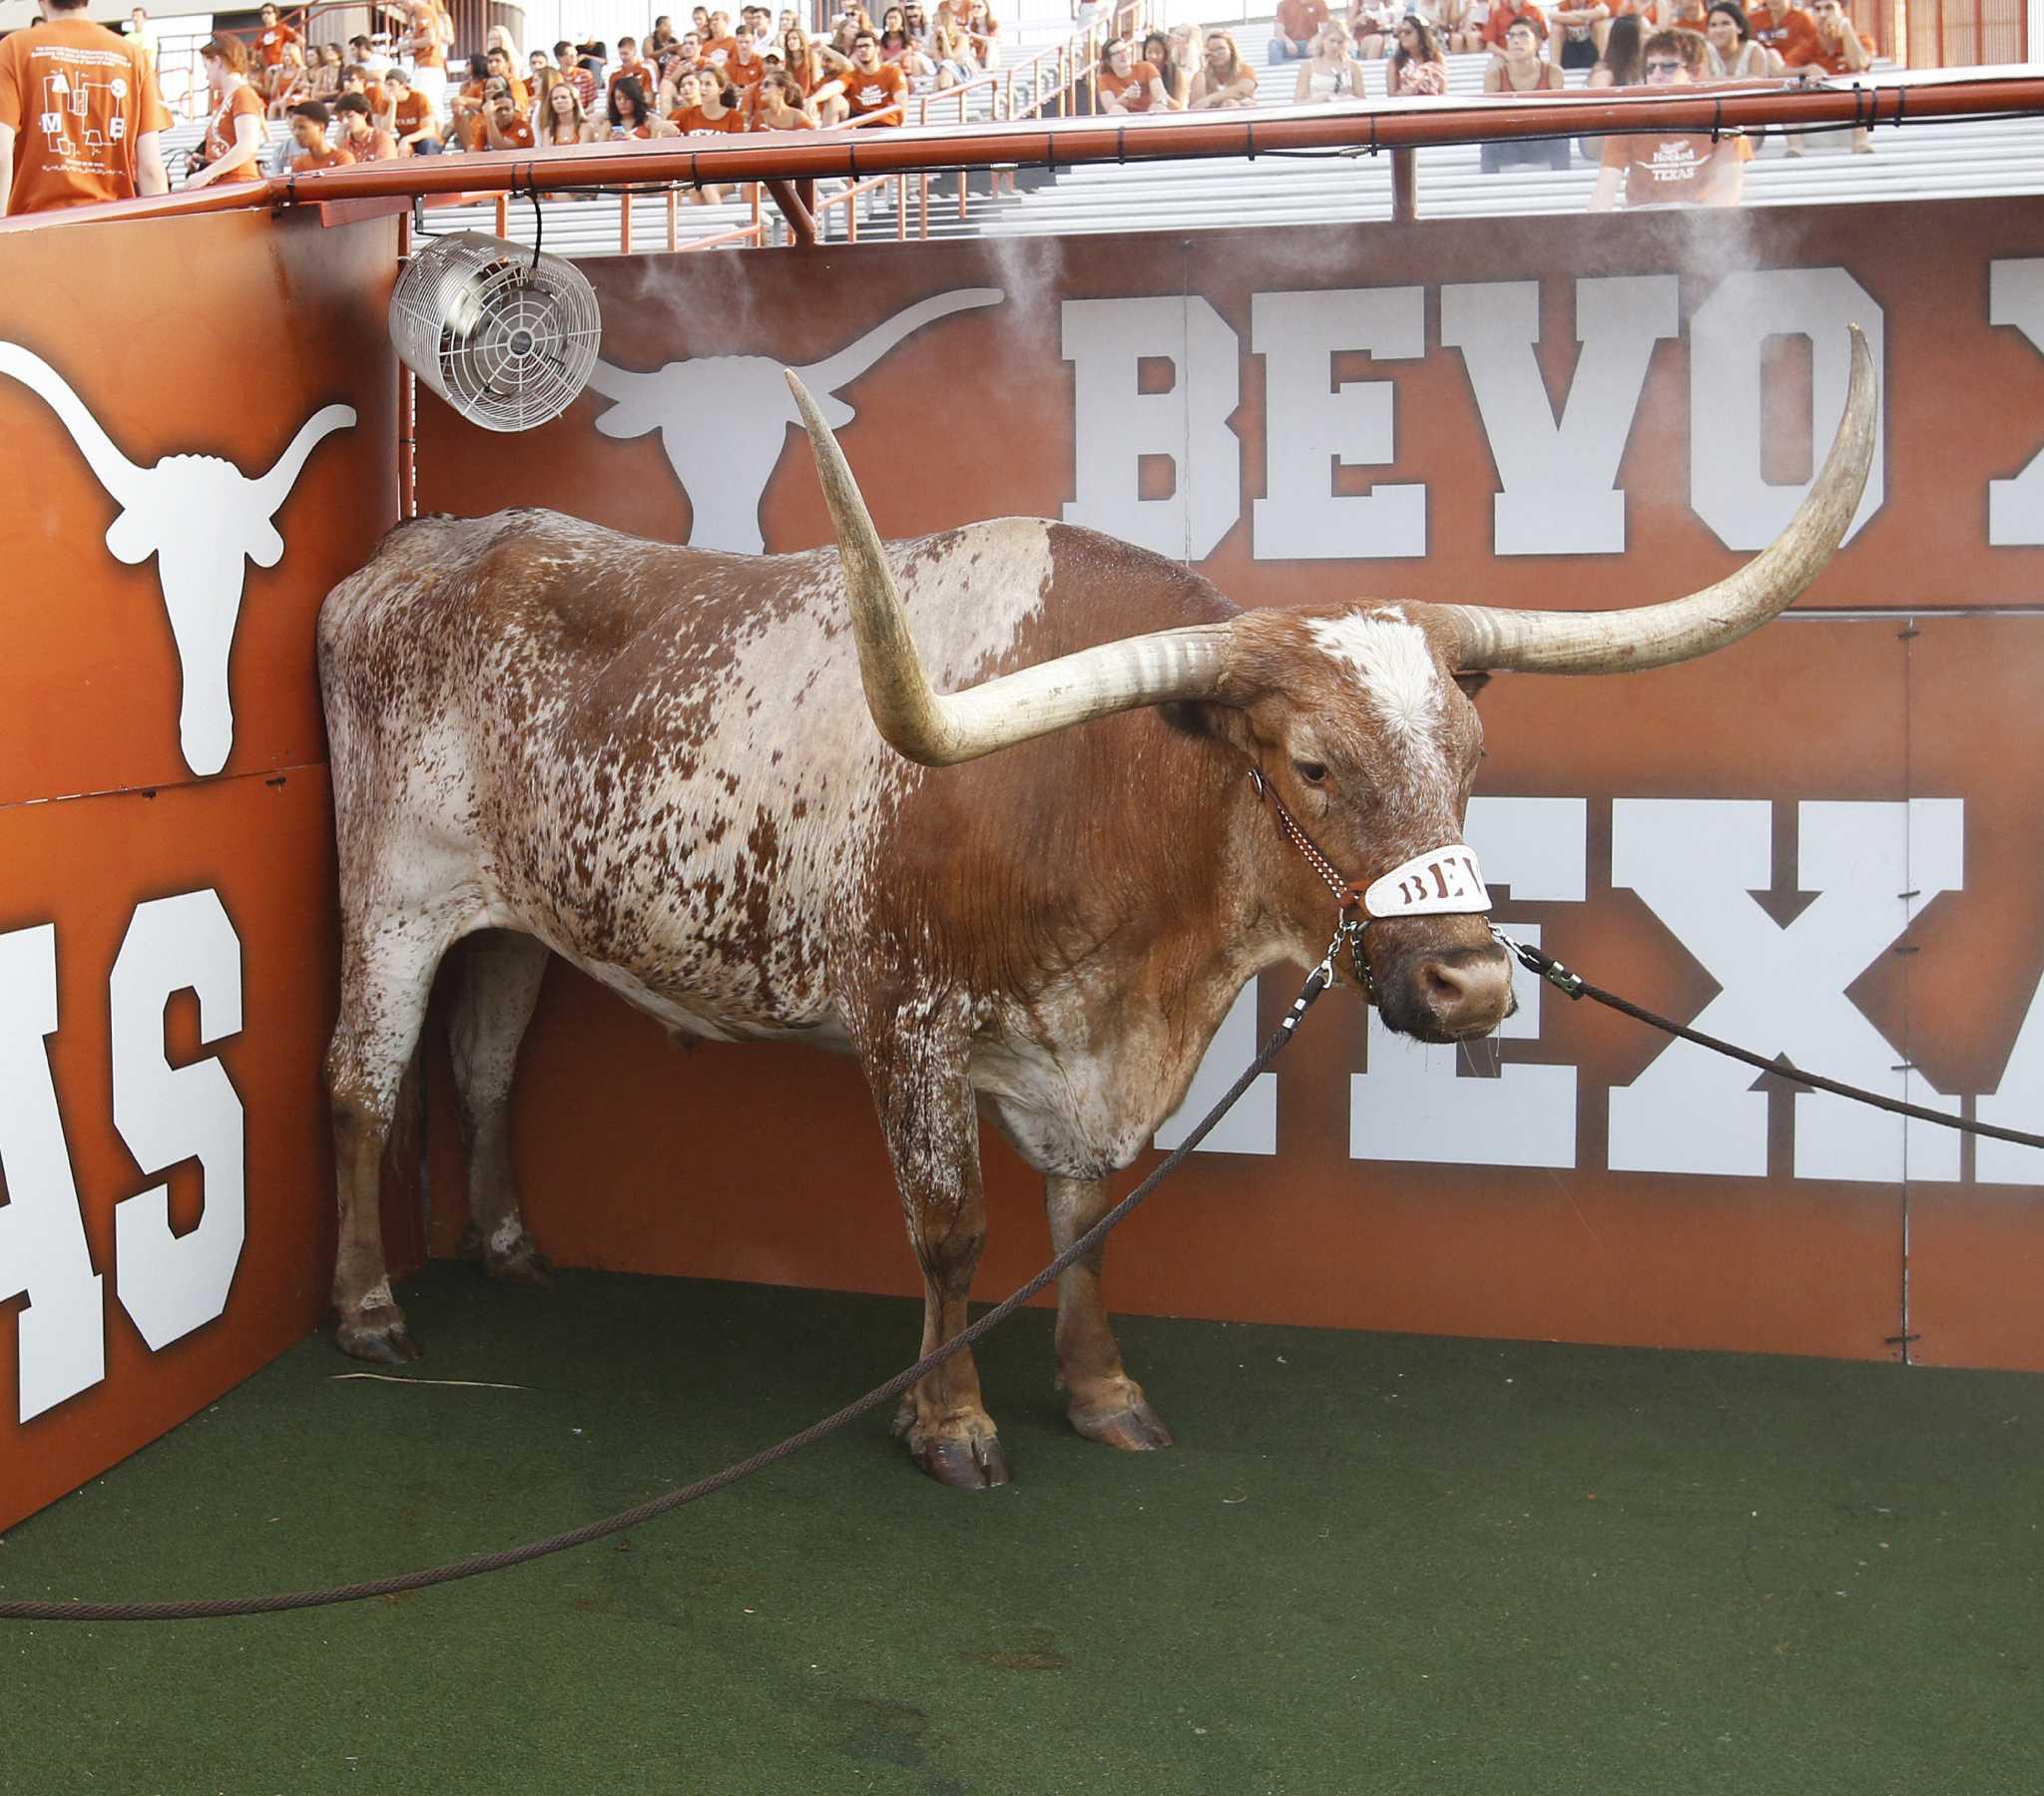 University Of Texas Mascot >> University Of Texas Mascot Bevo Xiv Retires After Cancer Diagnosis